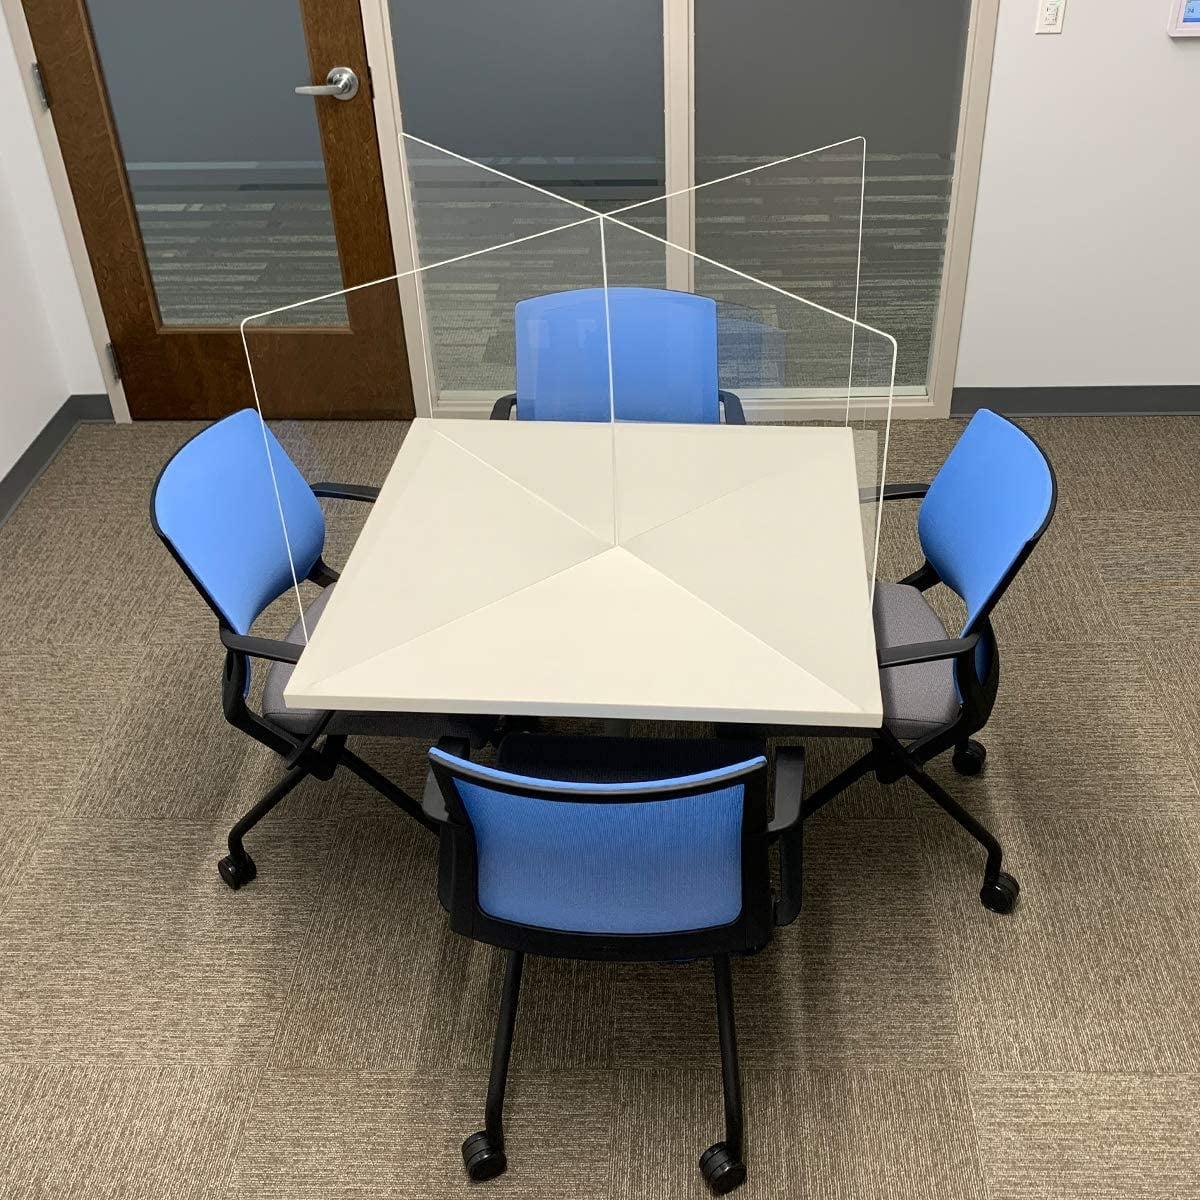 "Atezch/_ 16/""x16/"" Acrylic Table Top Divider Board Stand Plexiglass Sneeze Guard Plexy Glass Desk Shield Clear Desk Panel Barrier Acrylic Plexiglass Countertop Display Board"